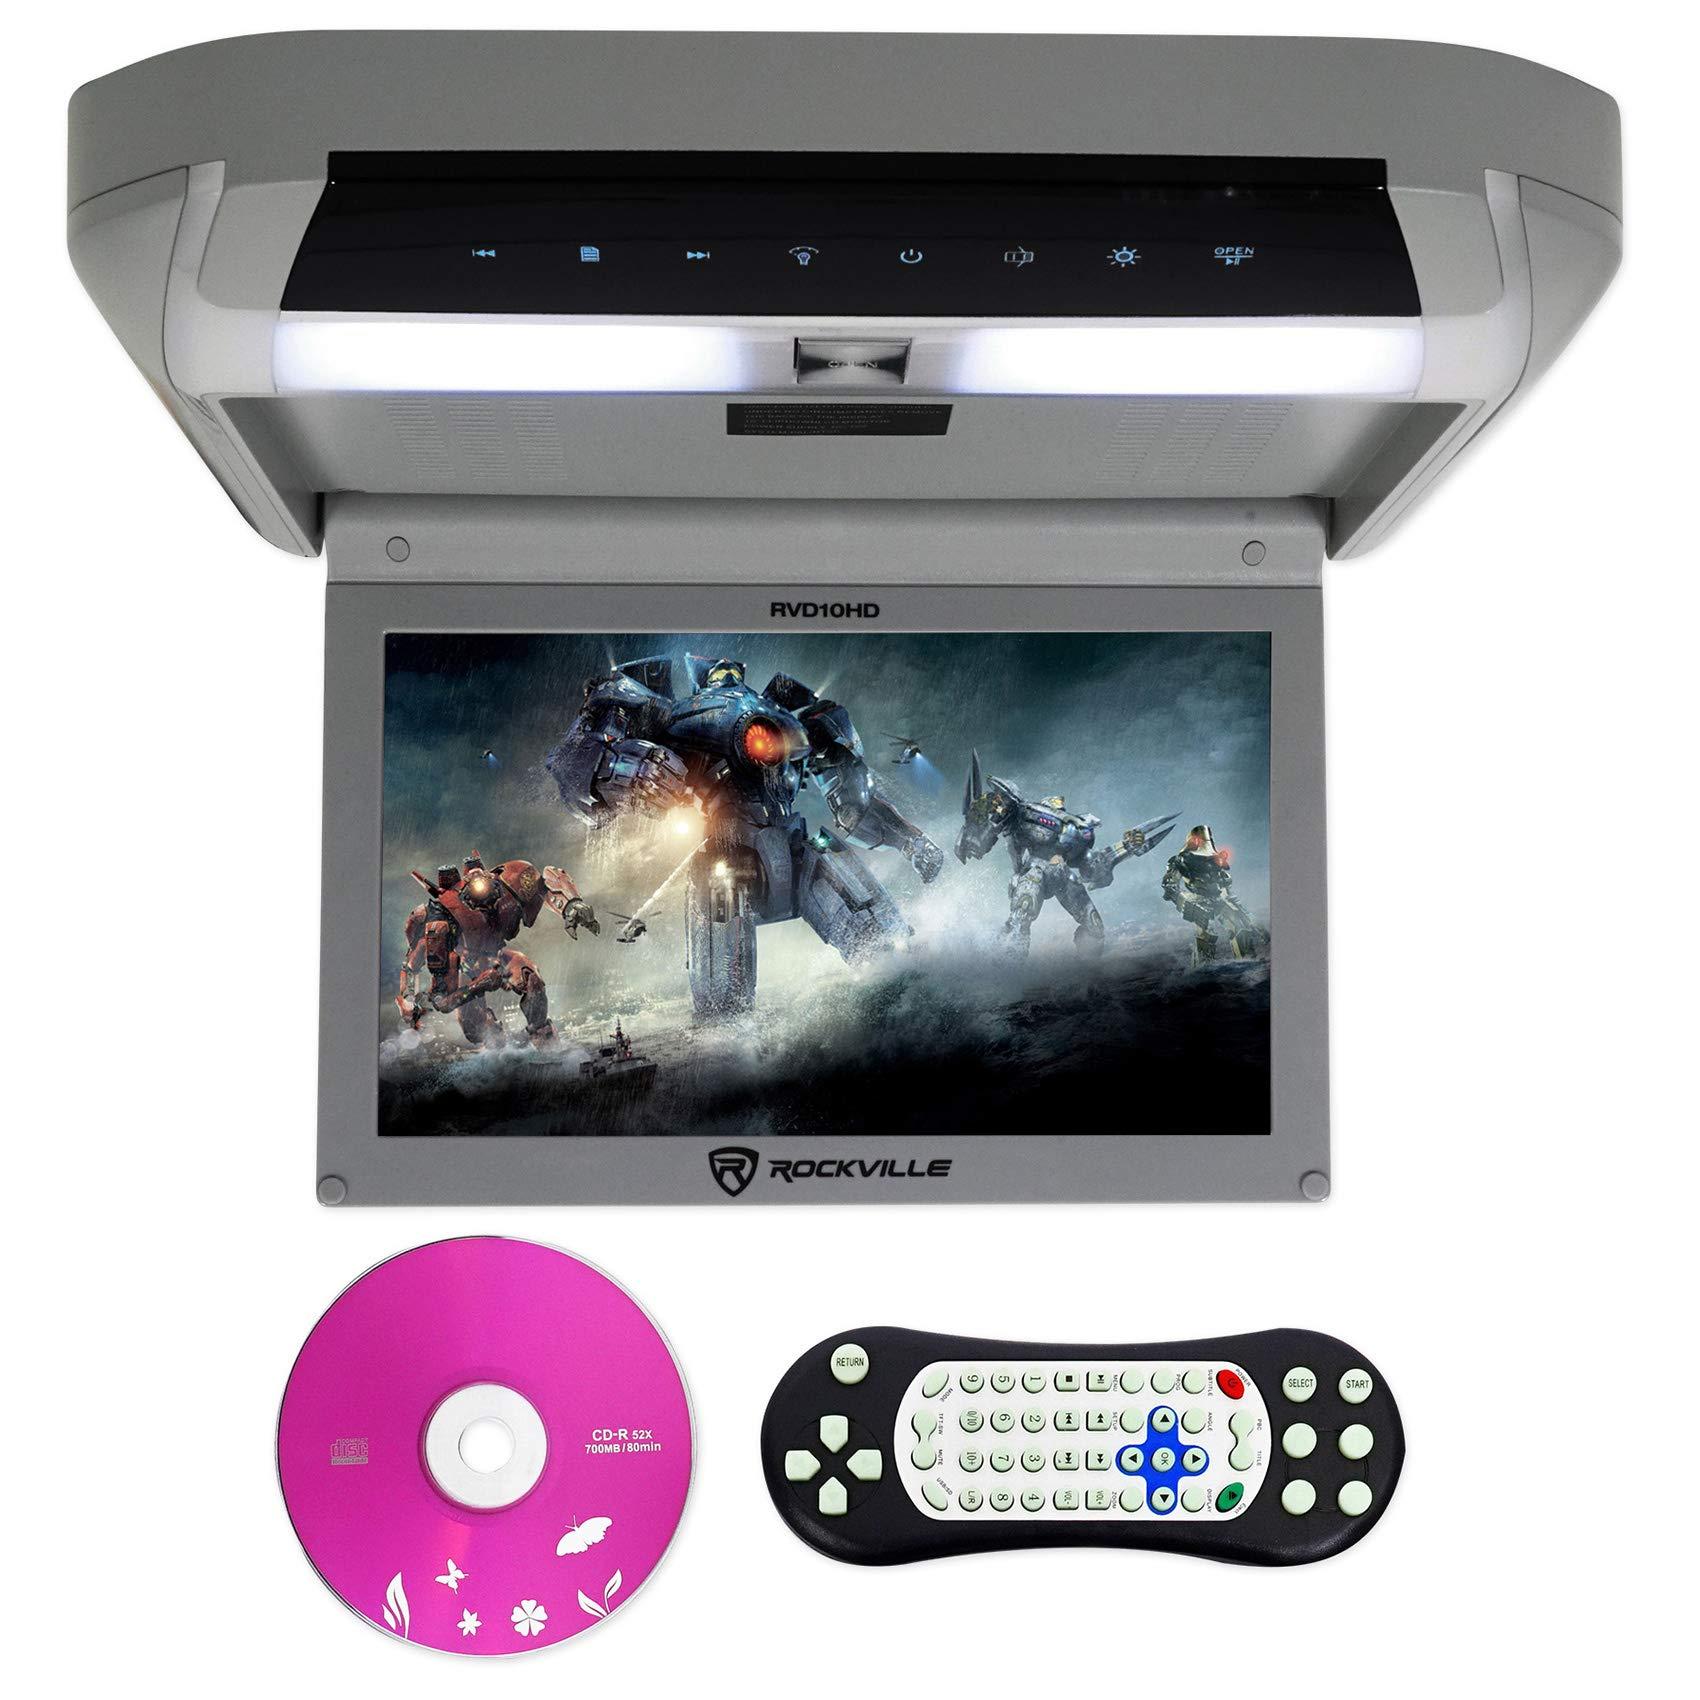 Rockville RVD10HD GR Monitor Player Games